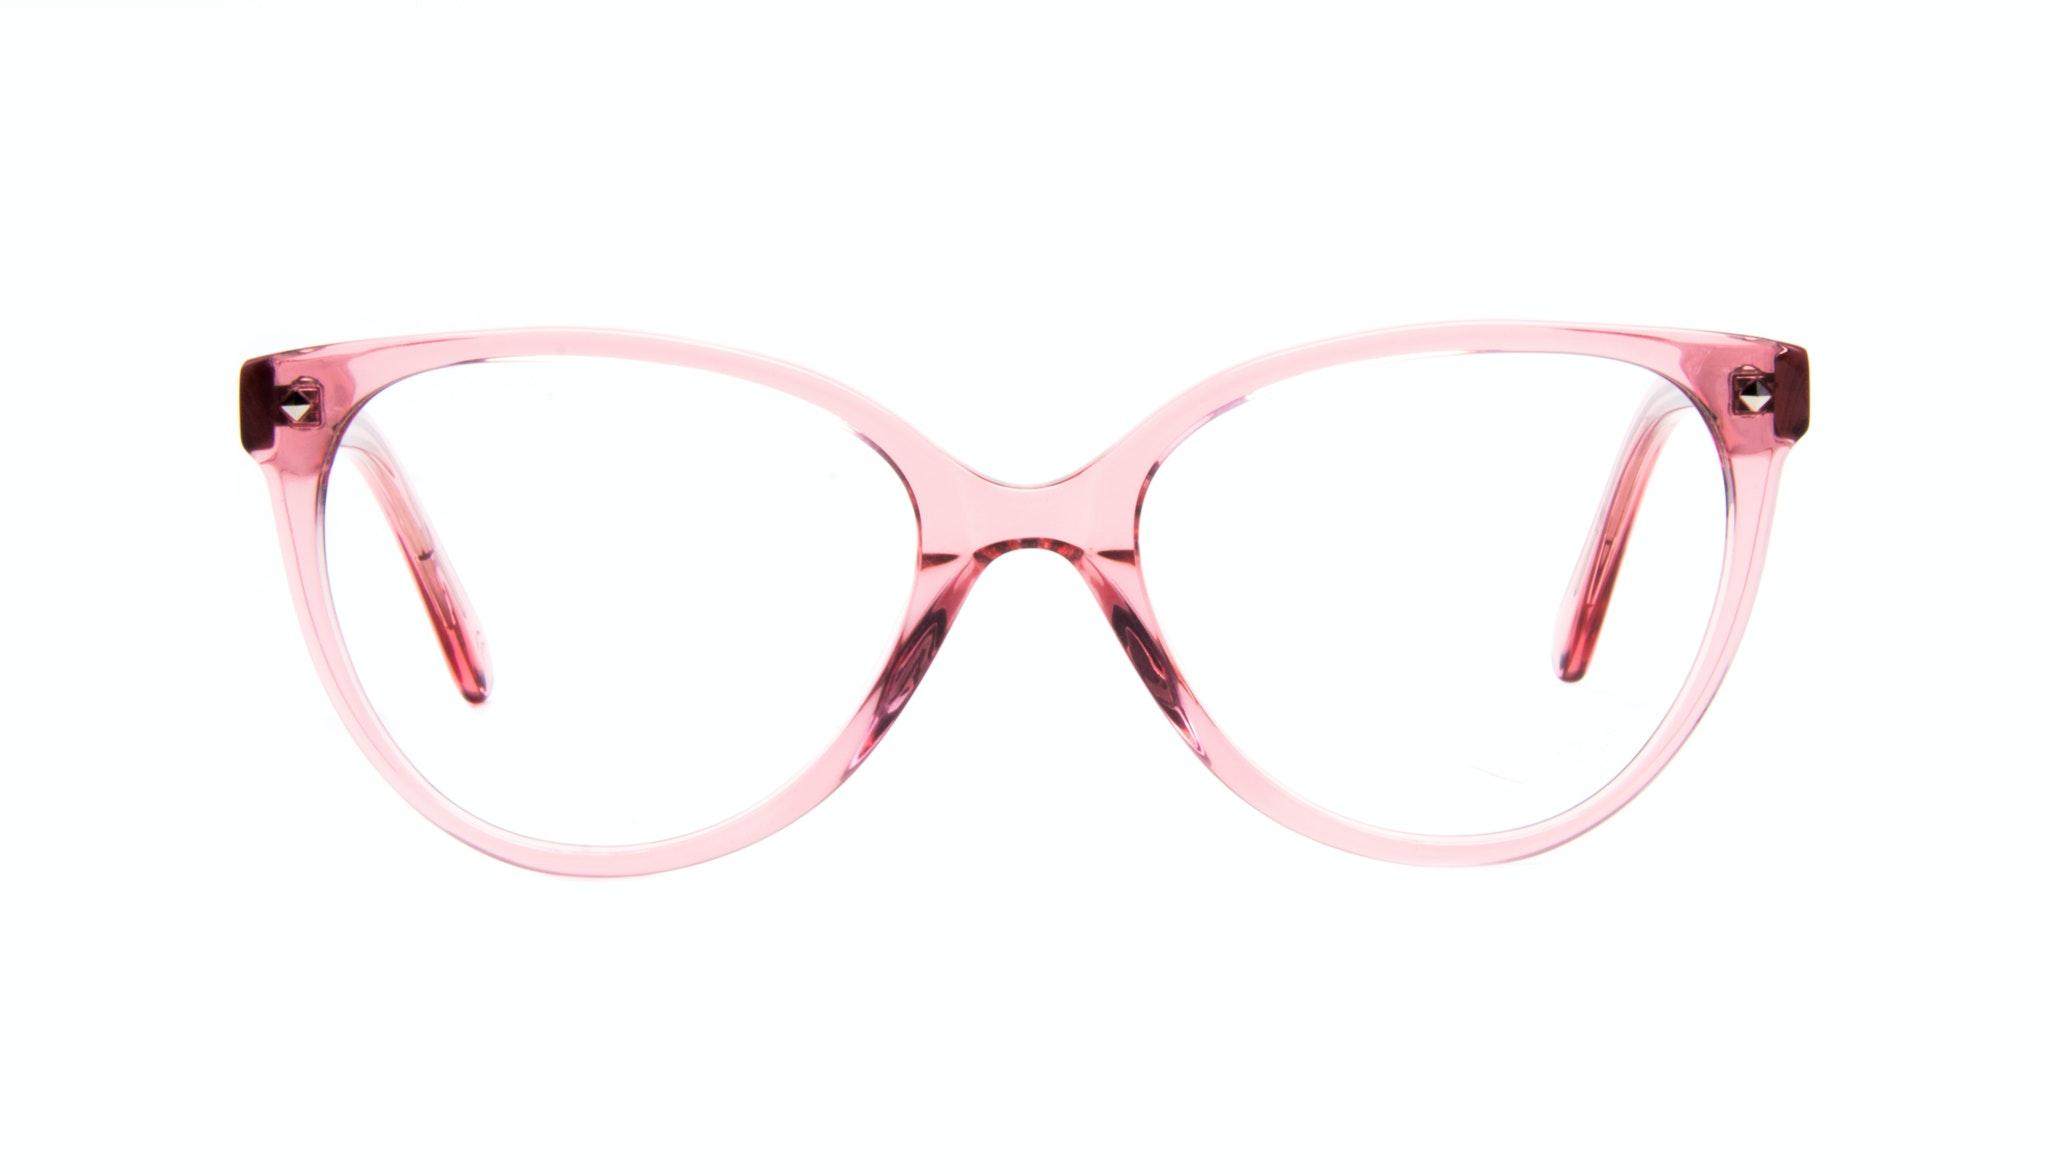 Affordable Fashion Glasses Cat Eye Eyeglasses Women Flawless Odyssey Front